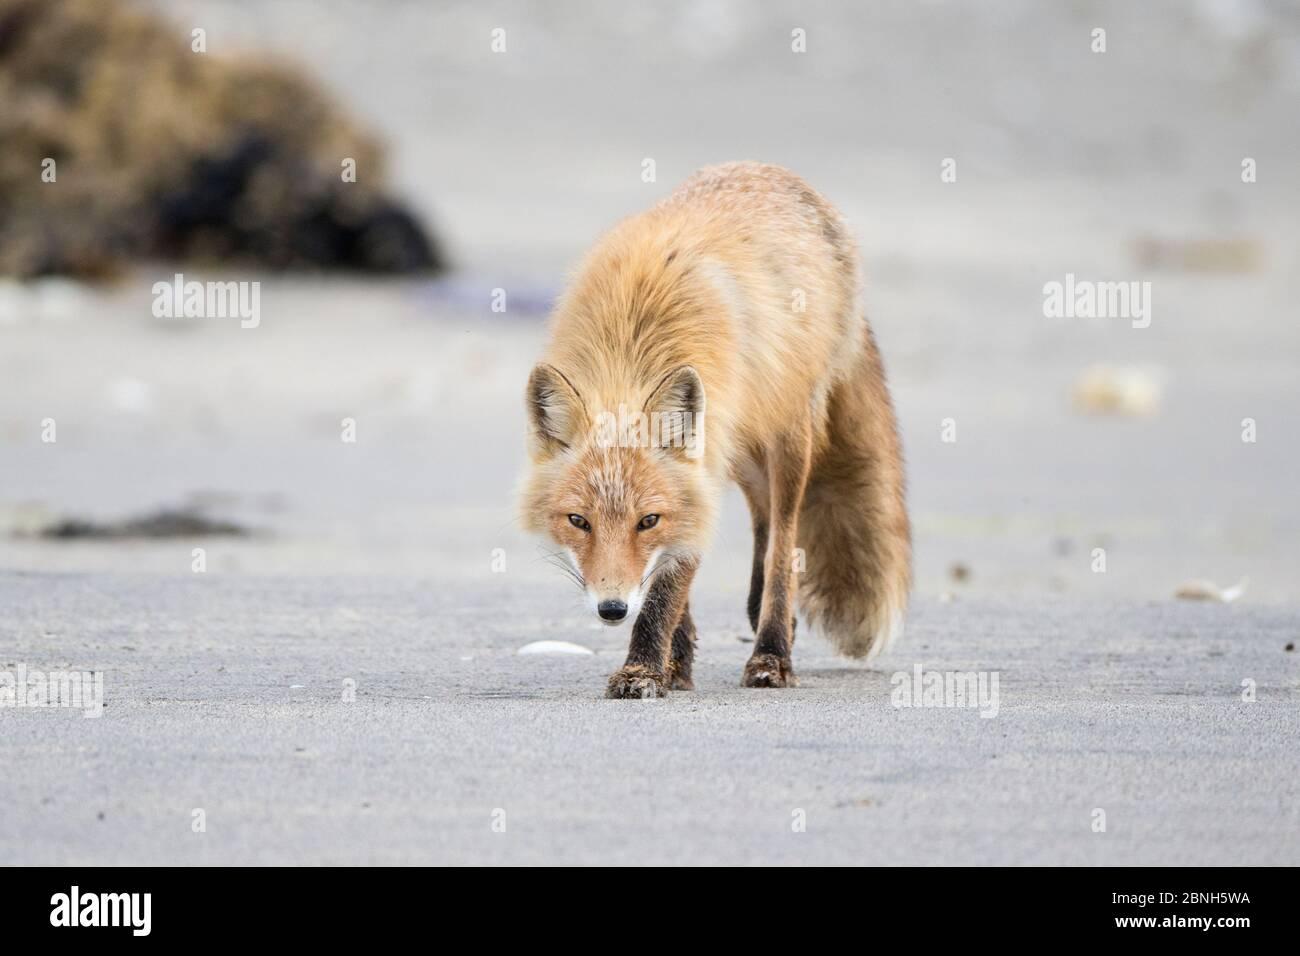 Renard roux (Vulpes vulpes) Parc national de Katmai, Alaska, États-Unis, juin. Banque D'Images